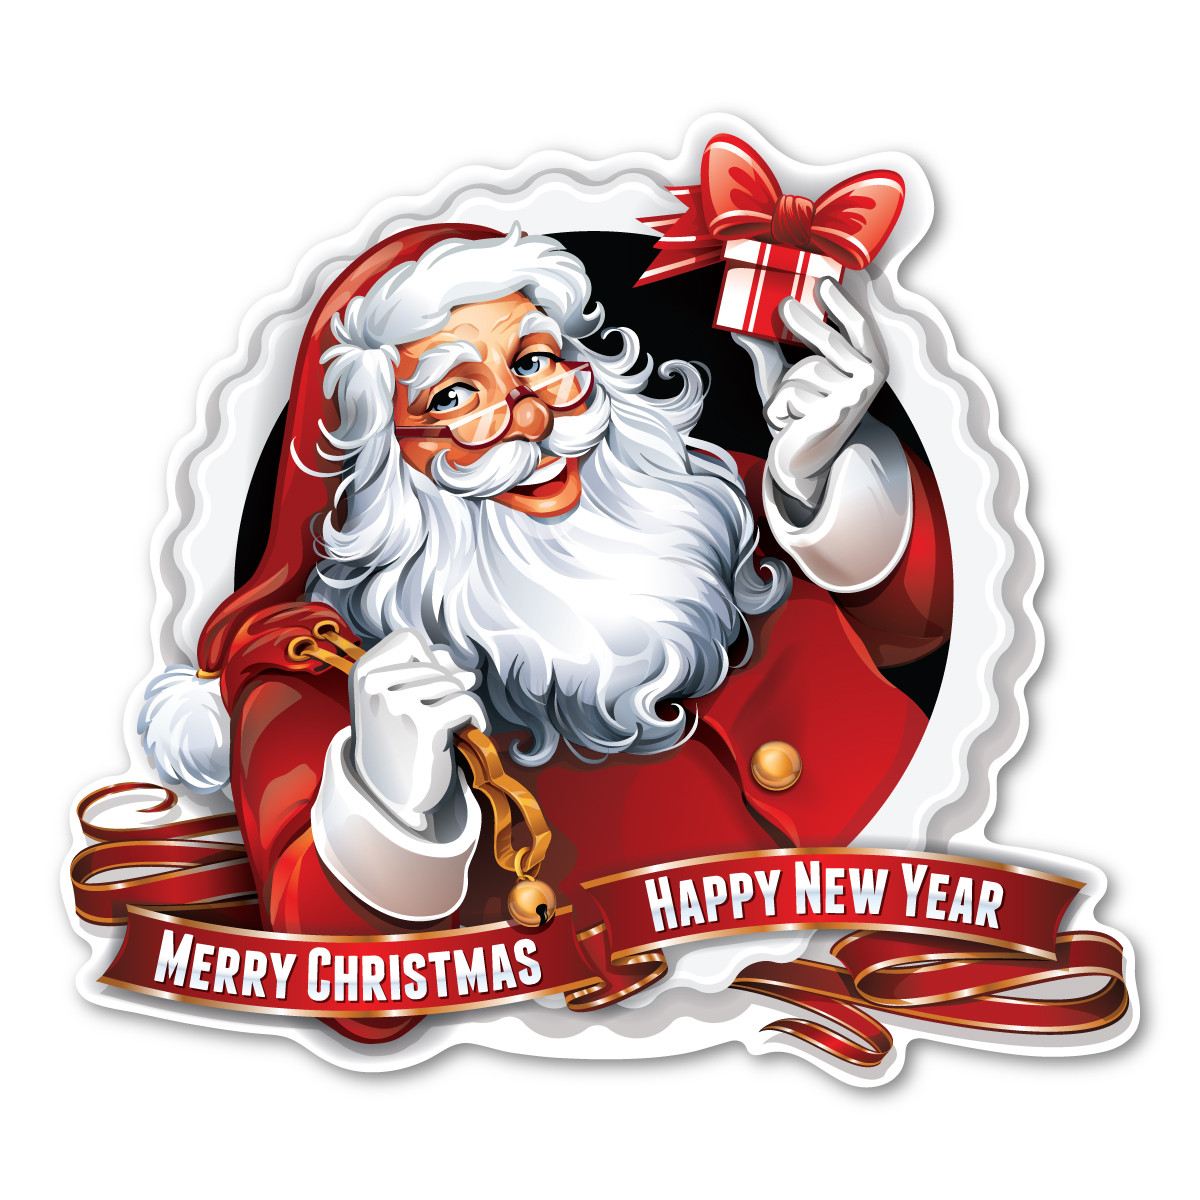 Merry Christmas/Happy New Year Santa Magnet | Magnet America